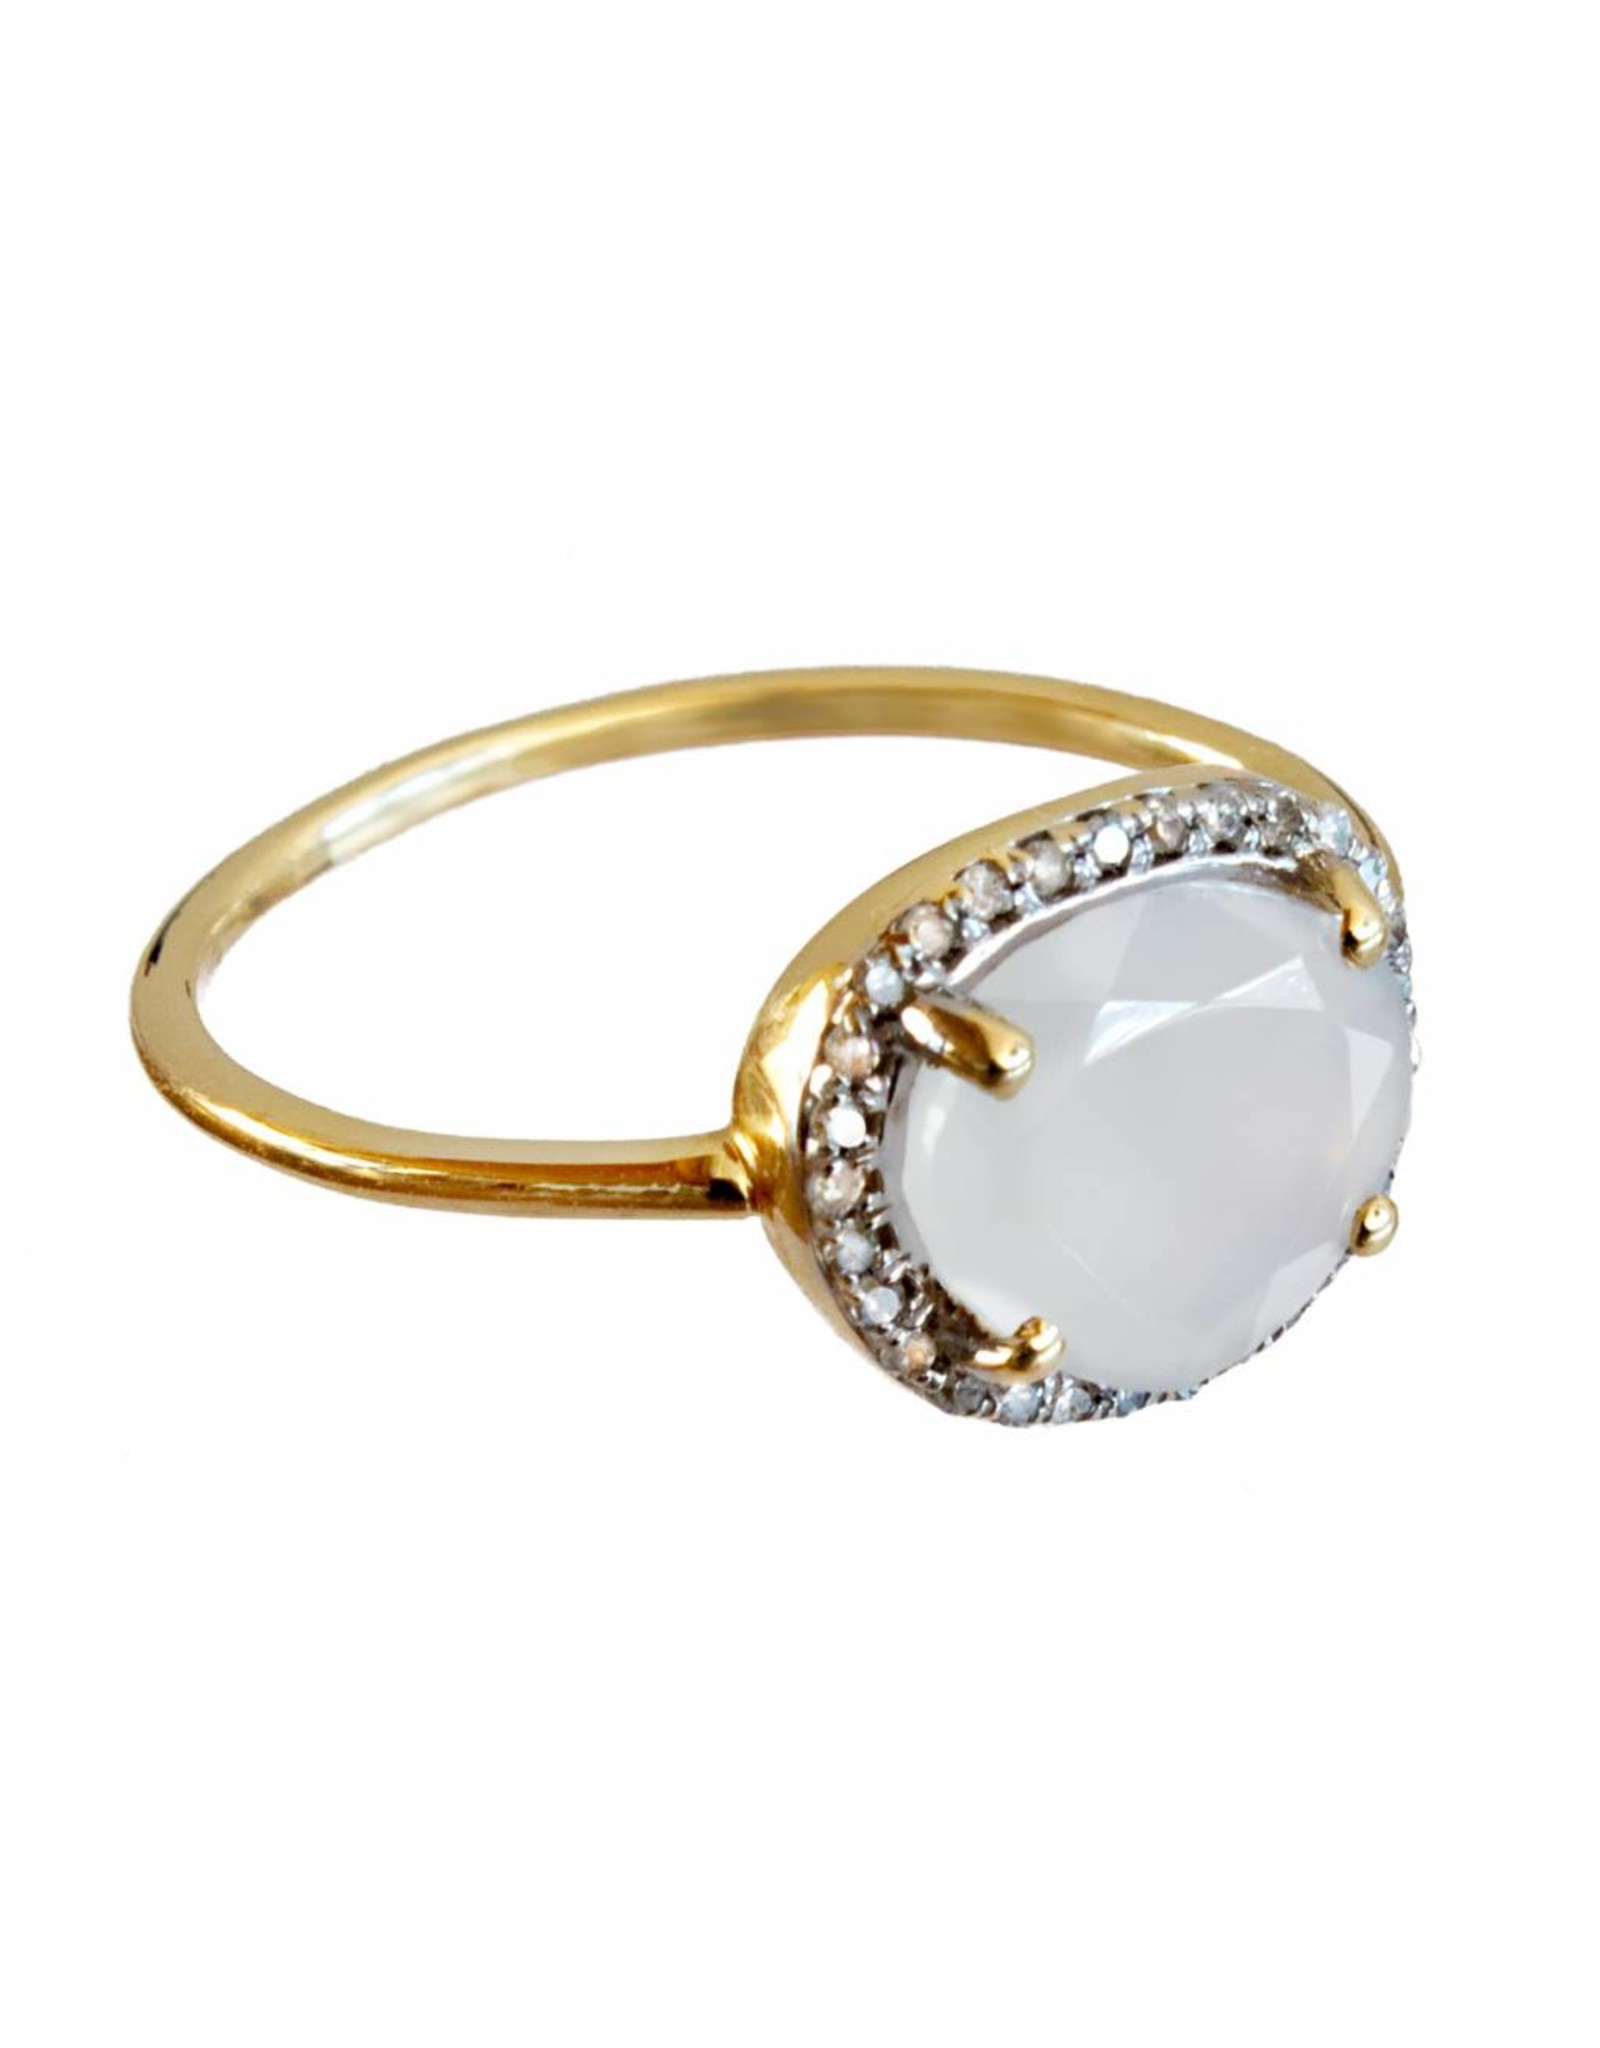 Bo Gold Ring - Gold - Natural calcedony - Diamonds